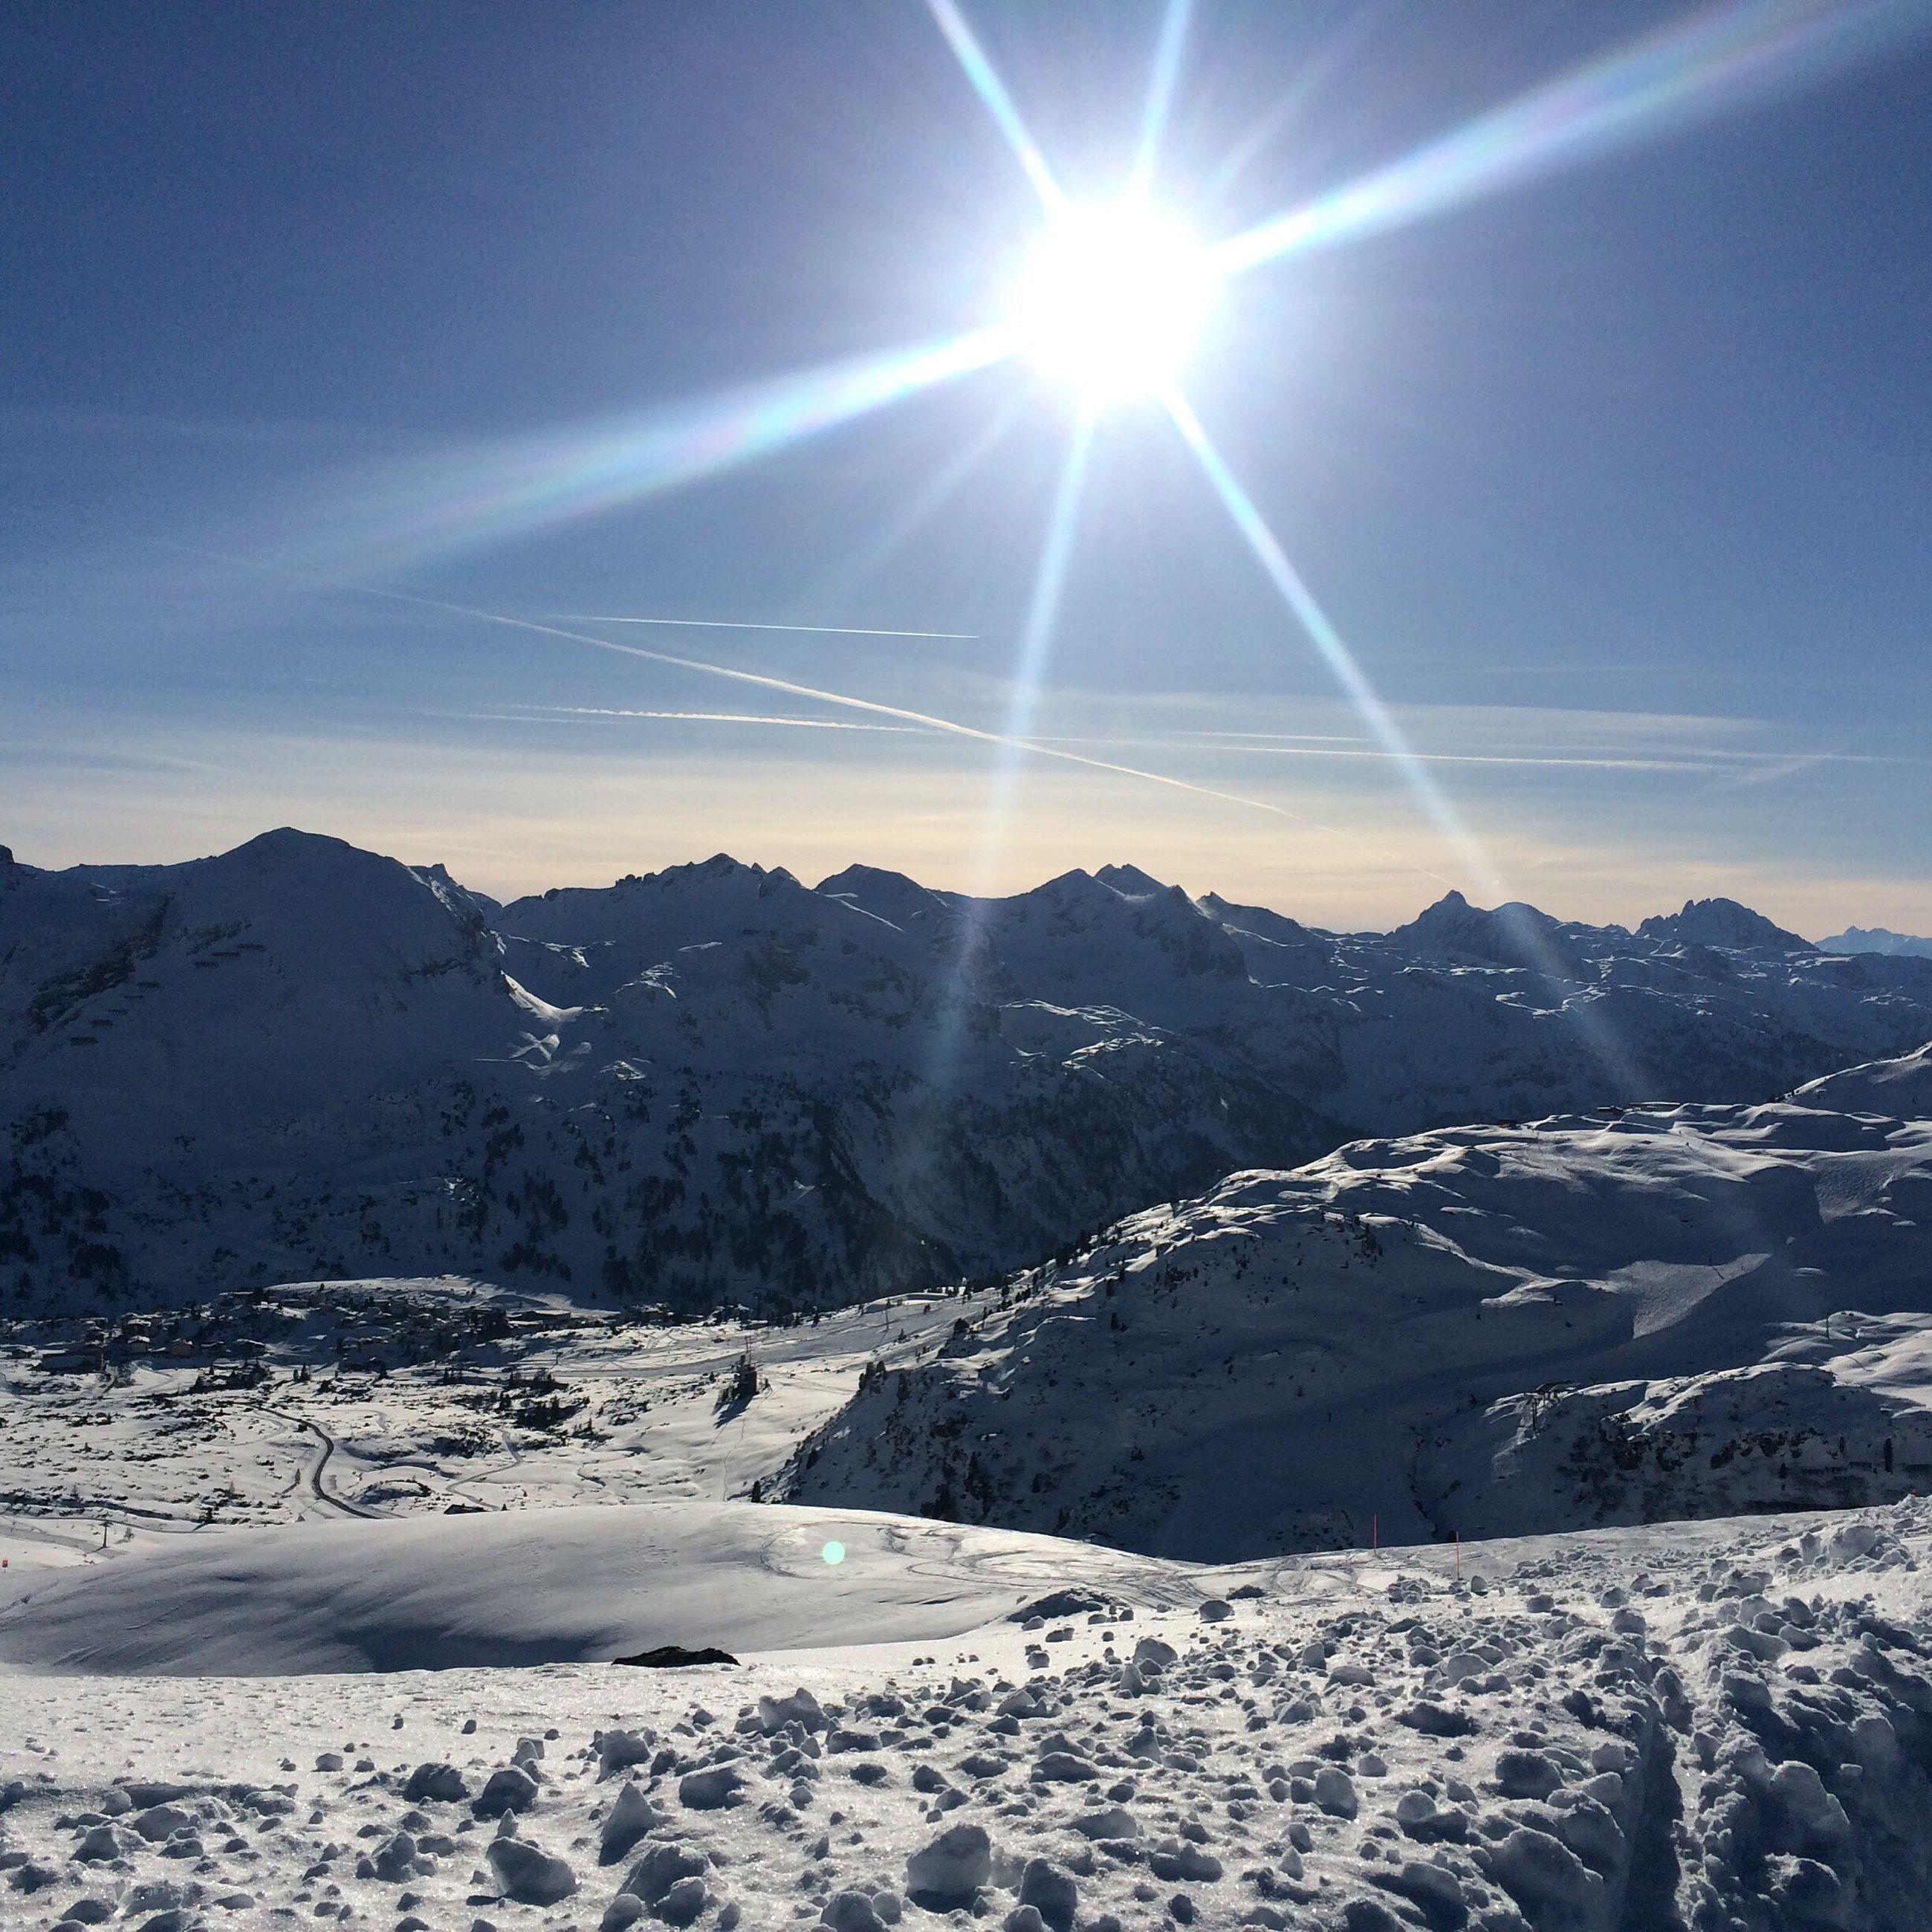 snow, sun, winter, cold temperature, mountain, sunbeam, tranquil scene, sunlight, tranquility, mountain range, scenics, landscape, beauty in nature, lens flare, nature, season, snowcapped mountain, sky, weather, sunny